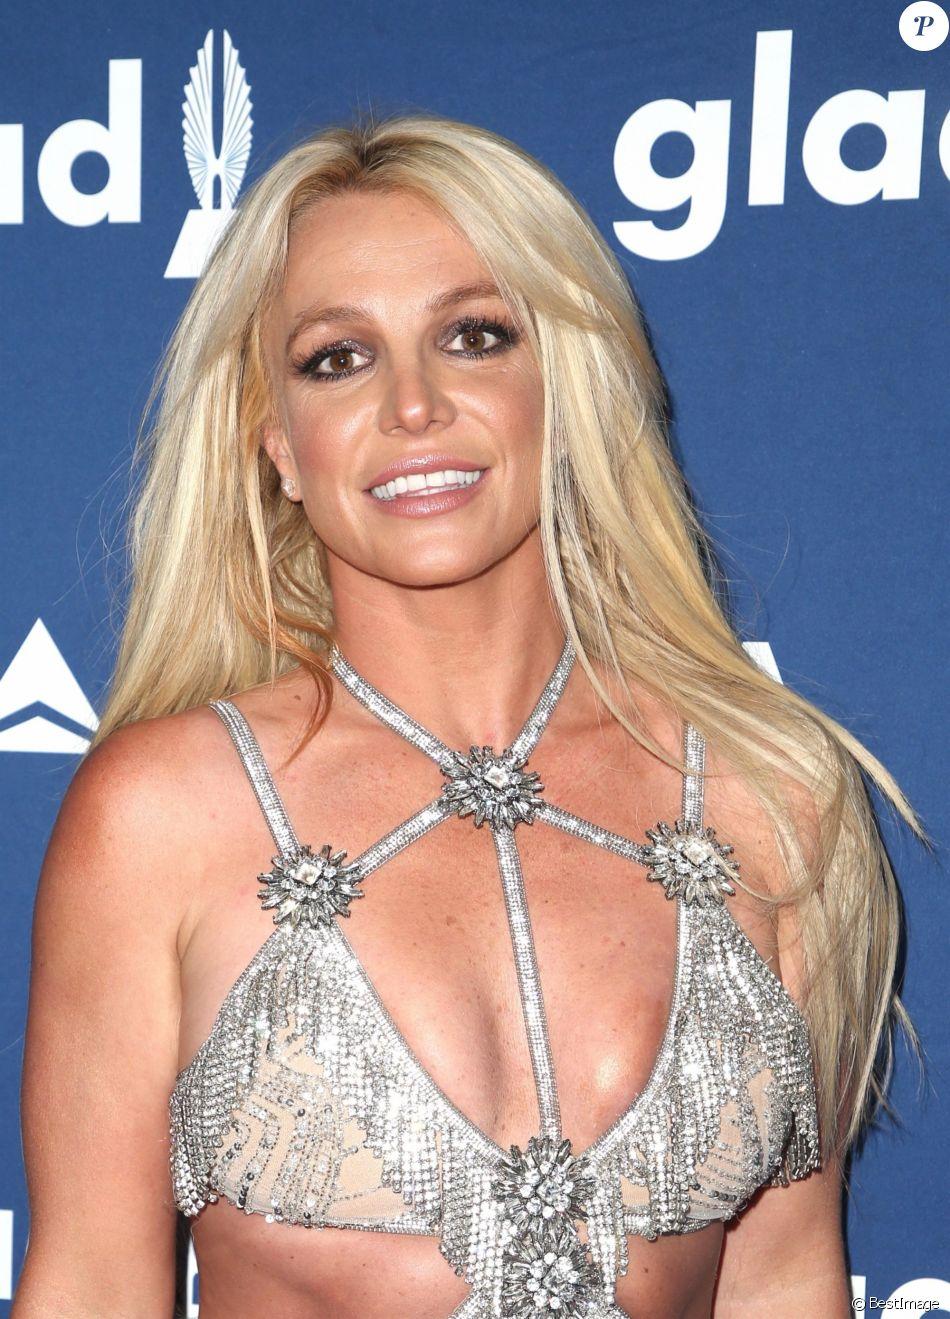 Britney Spears à la soirée GLAAD Media Awards Rising Stars à l'hôtel Beverly Hilton à Beverly Hills, le 12 avril 2018.